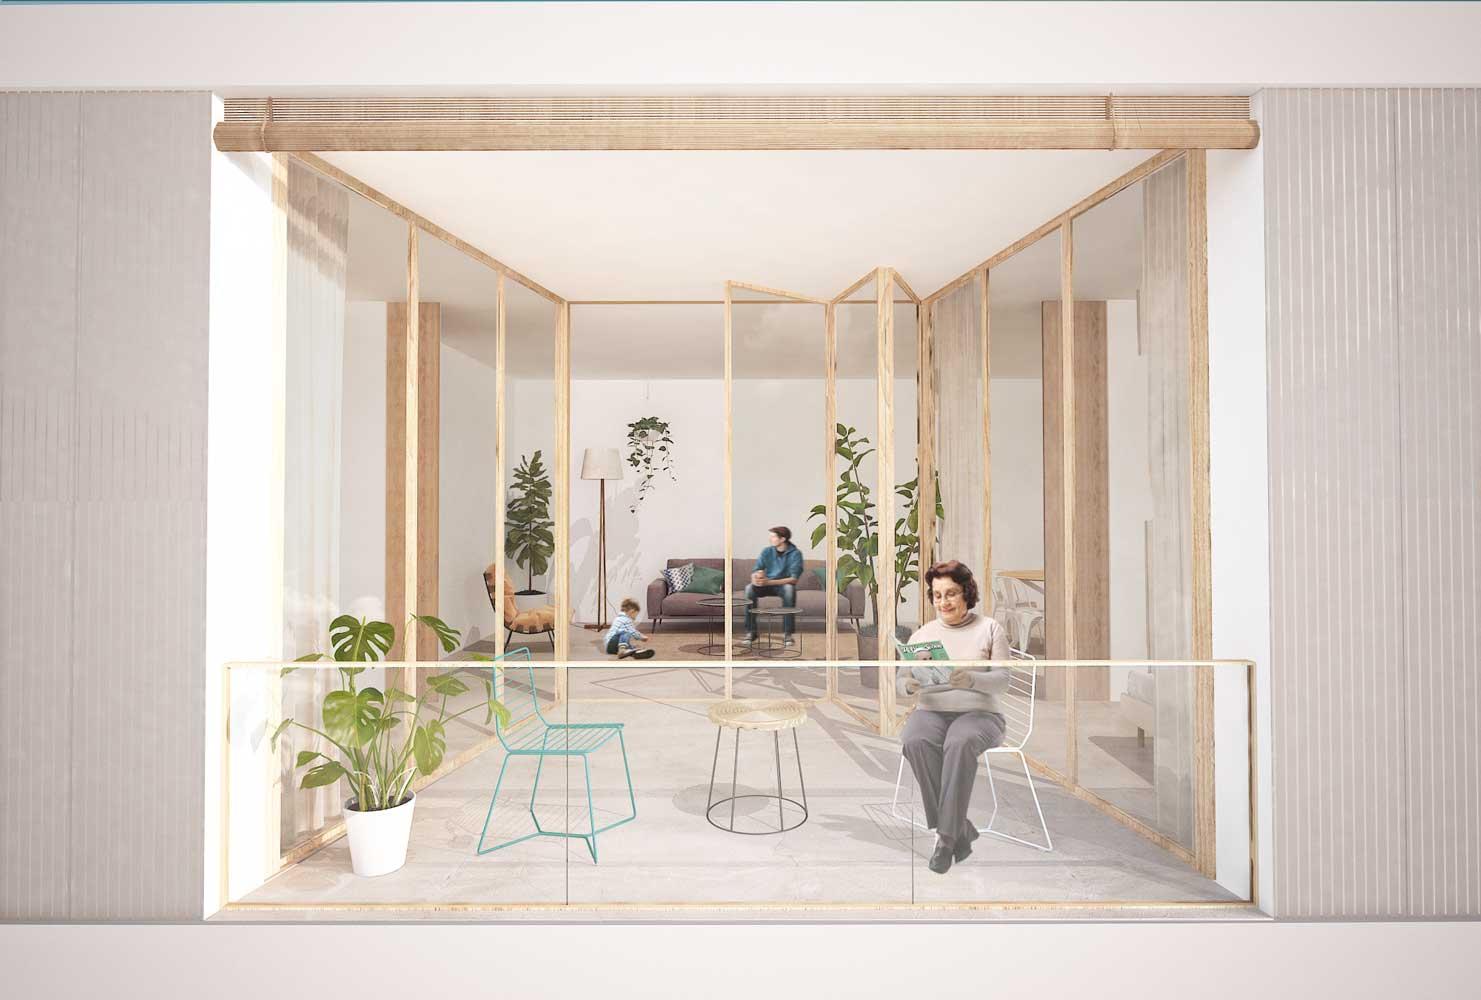 concurso vivienda protegida masnou sostenible arquitopia